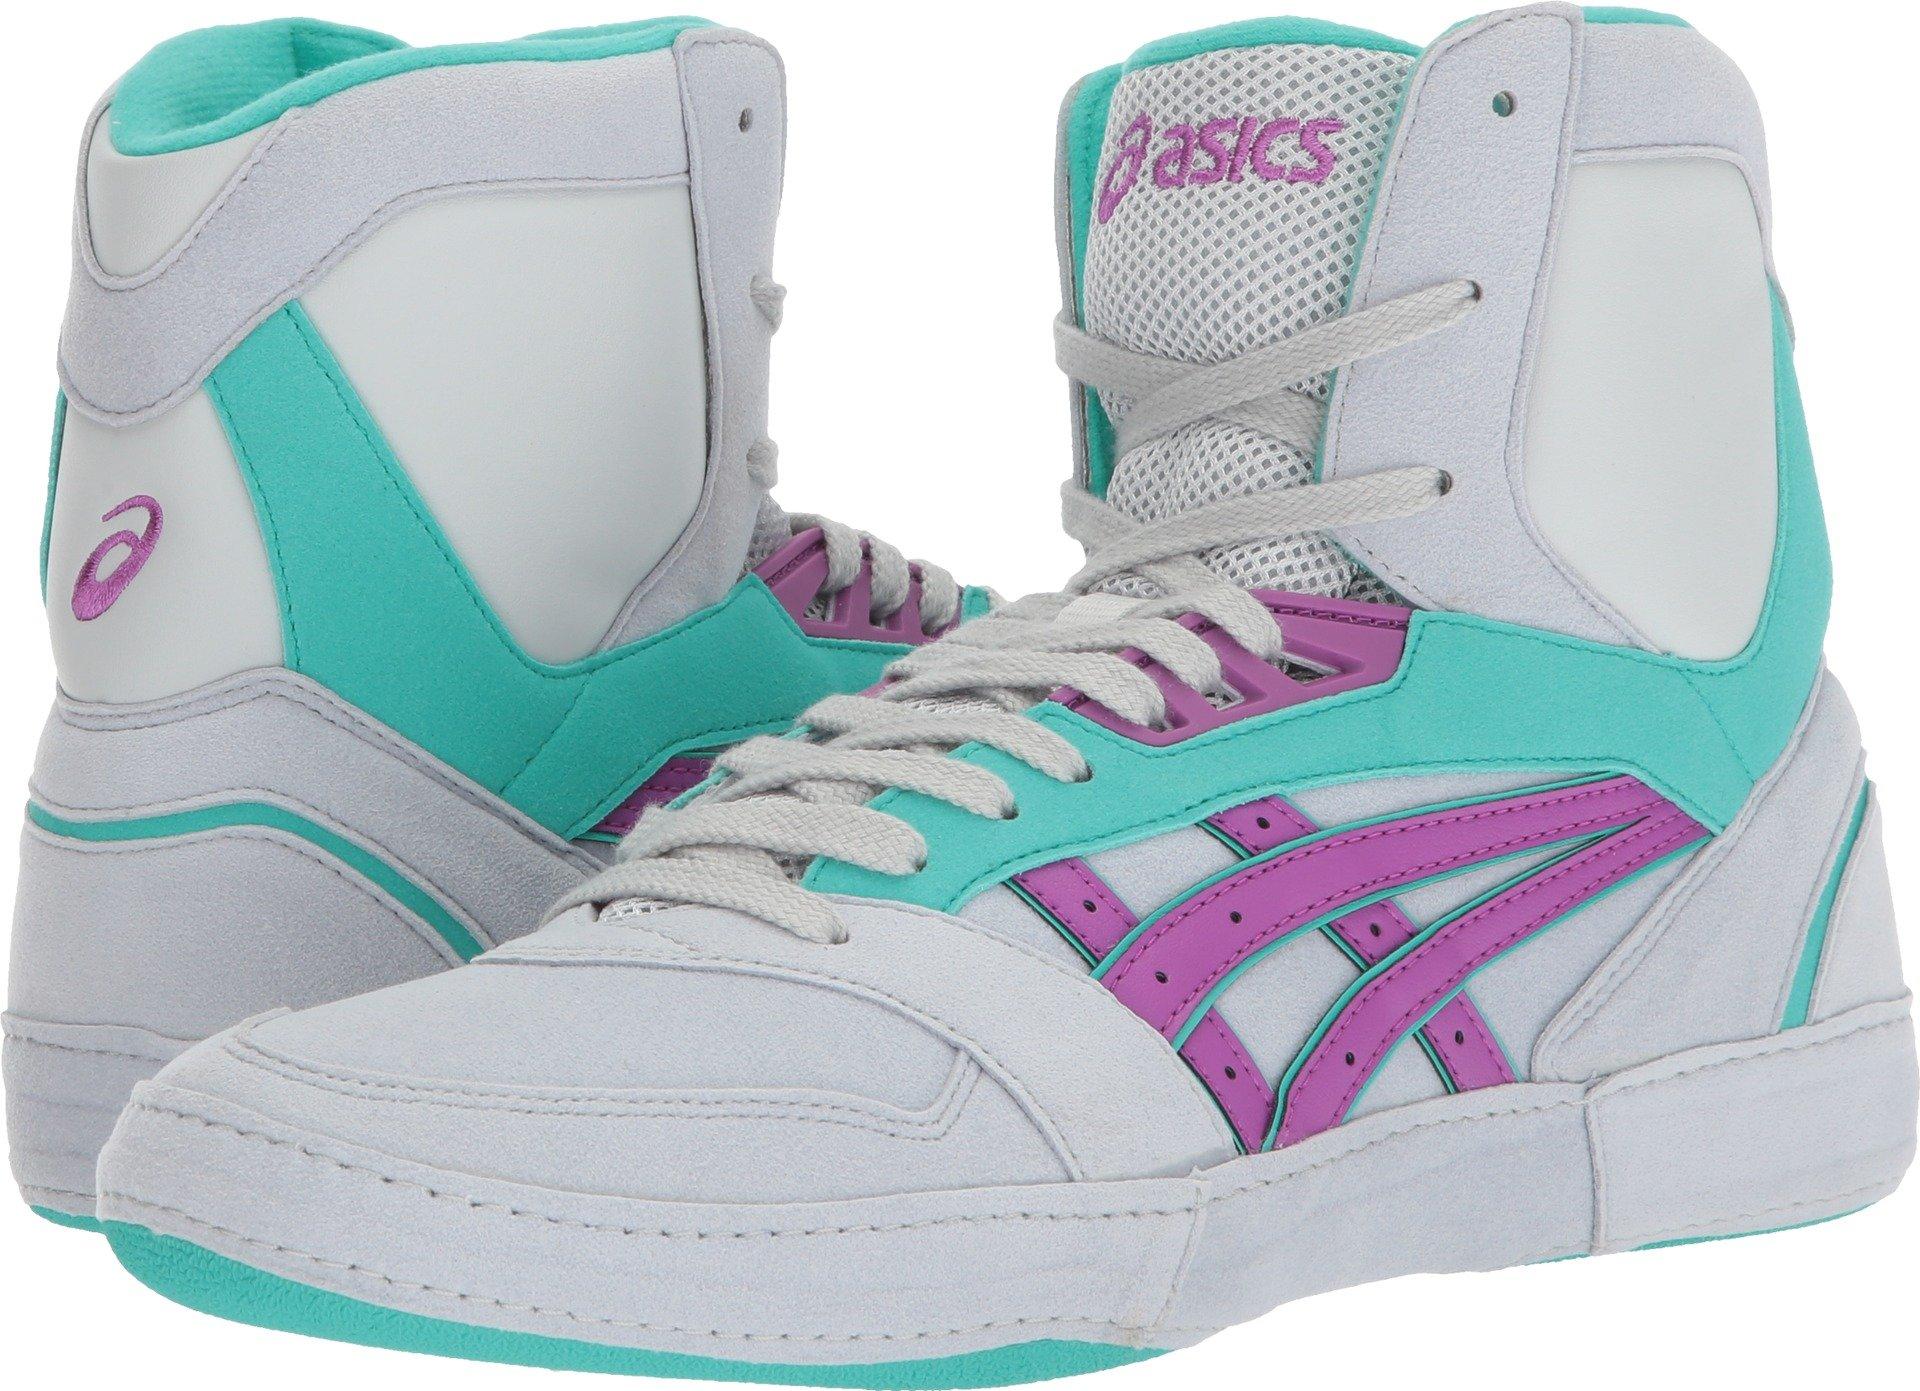 ASICS International Lyte Mens Wrestling Shoes, Glacier Grey/Orchid/Atlantis, Size 11.5 by ASICS